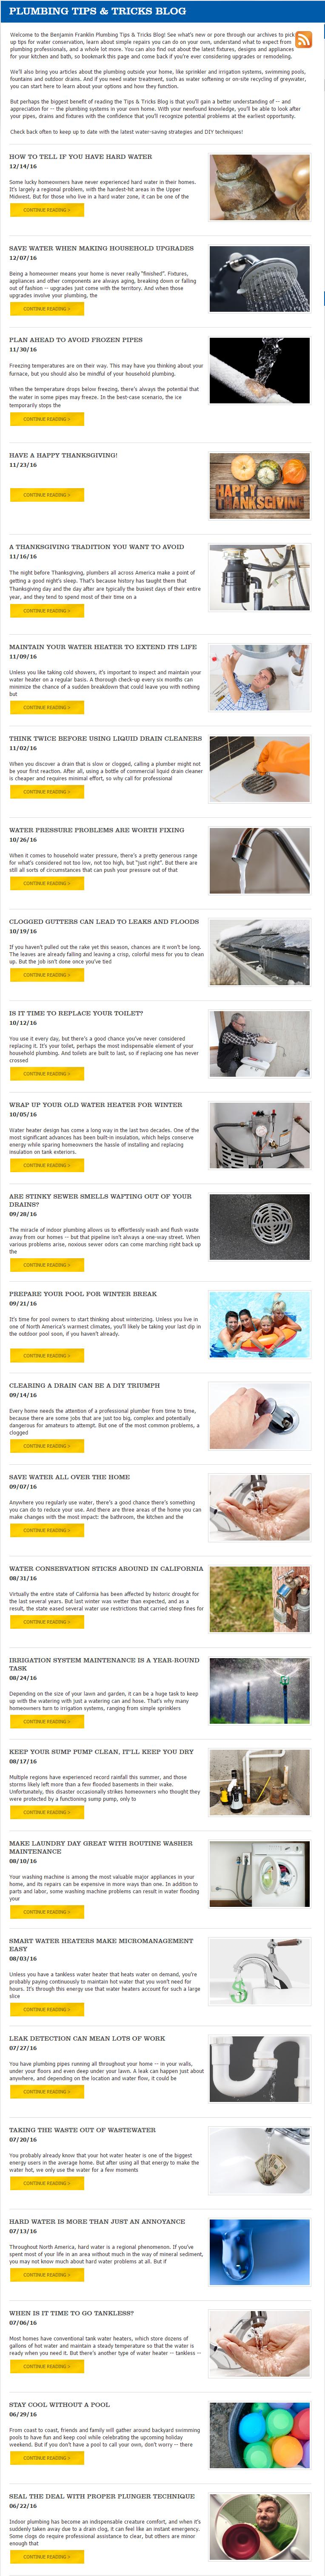 benjamin franklin plumbing blog